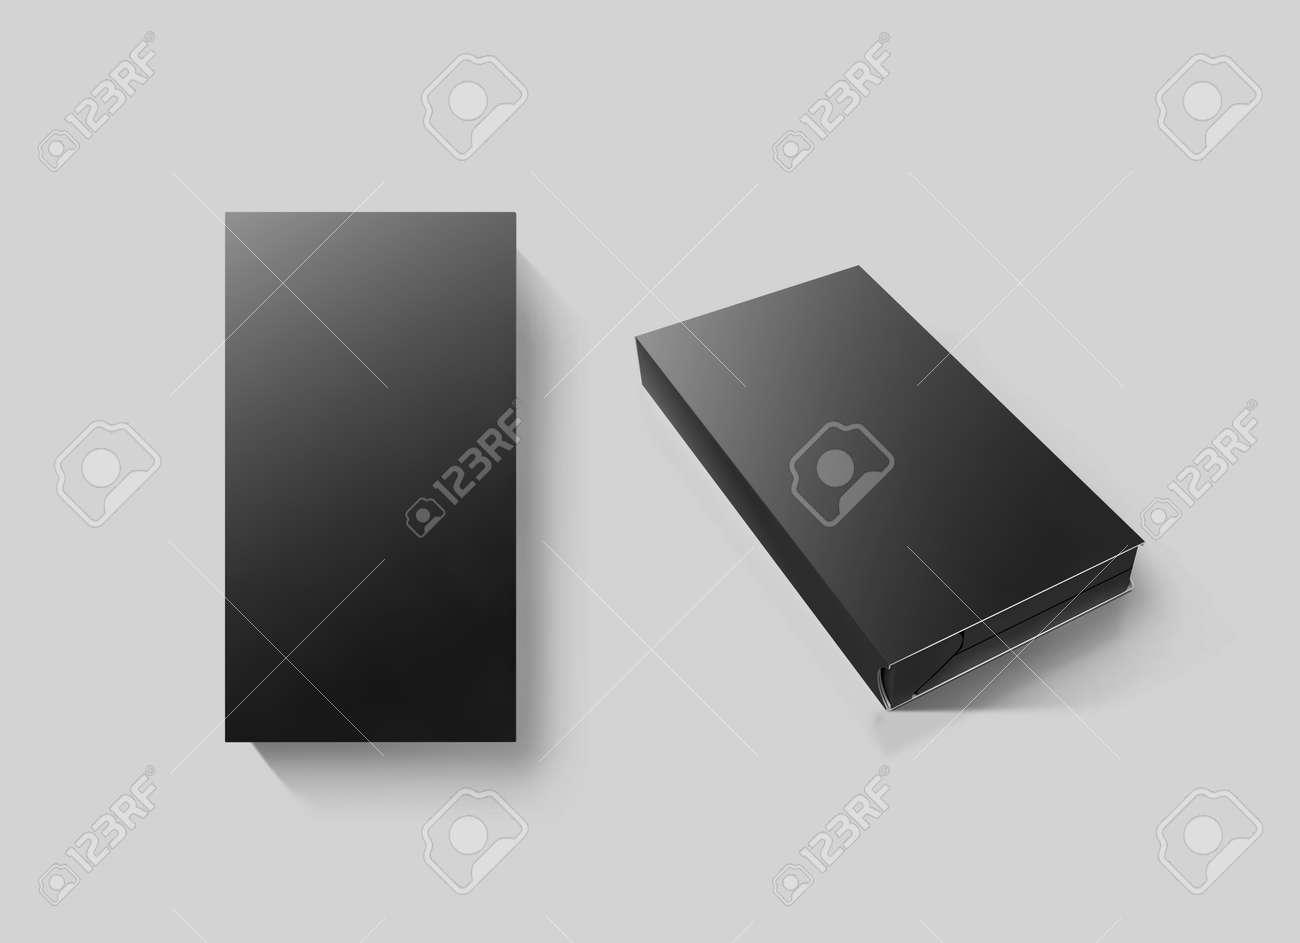 Blank Black Video Cassette Tape Box Mockup Set Isolated 3d Stock